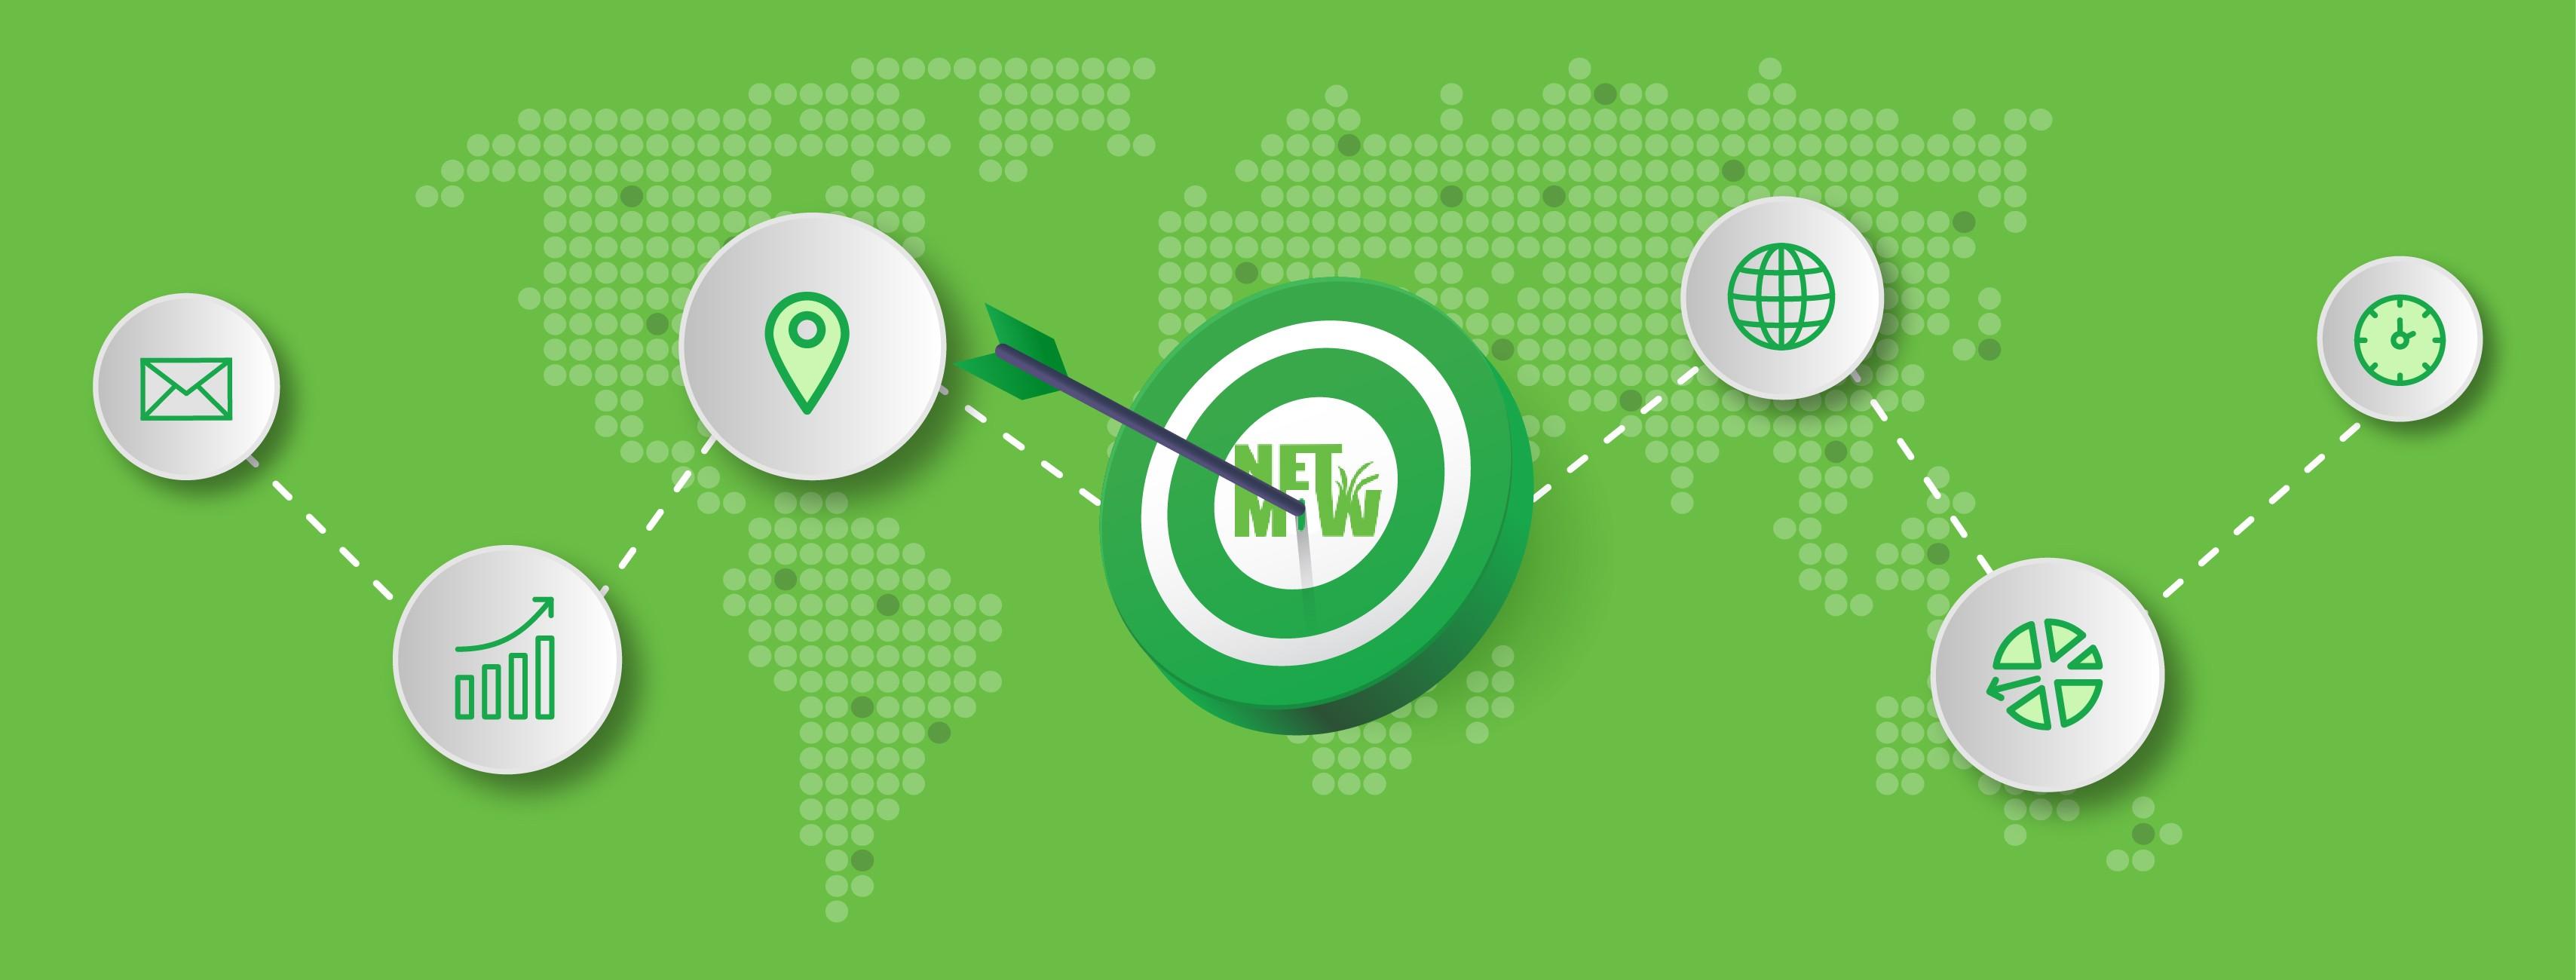 NETMOW | LinkedIn